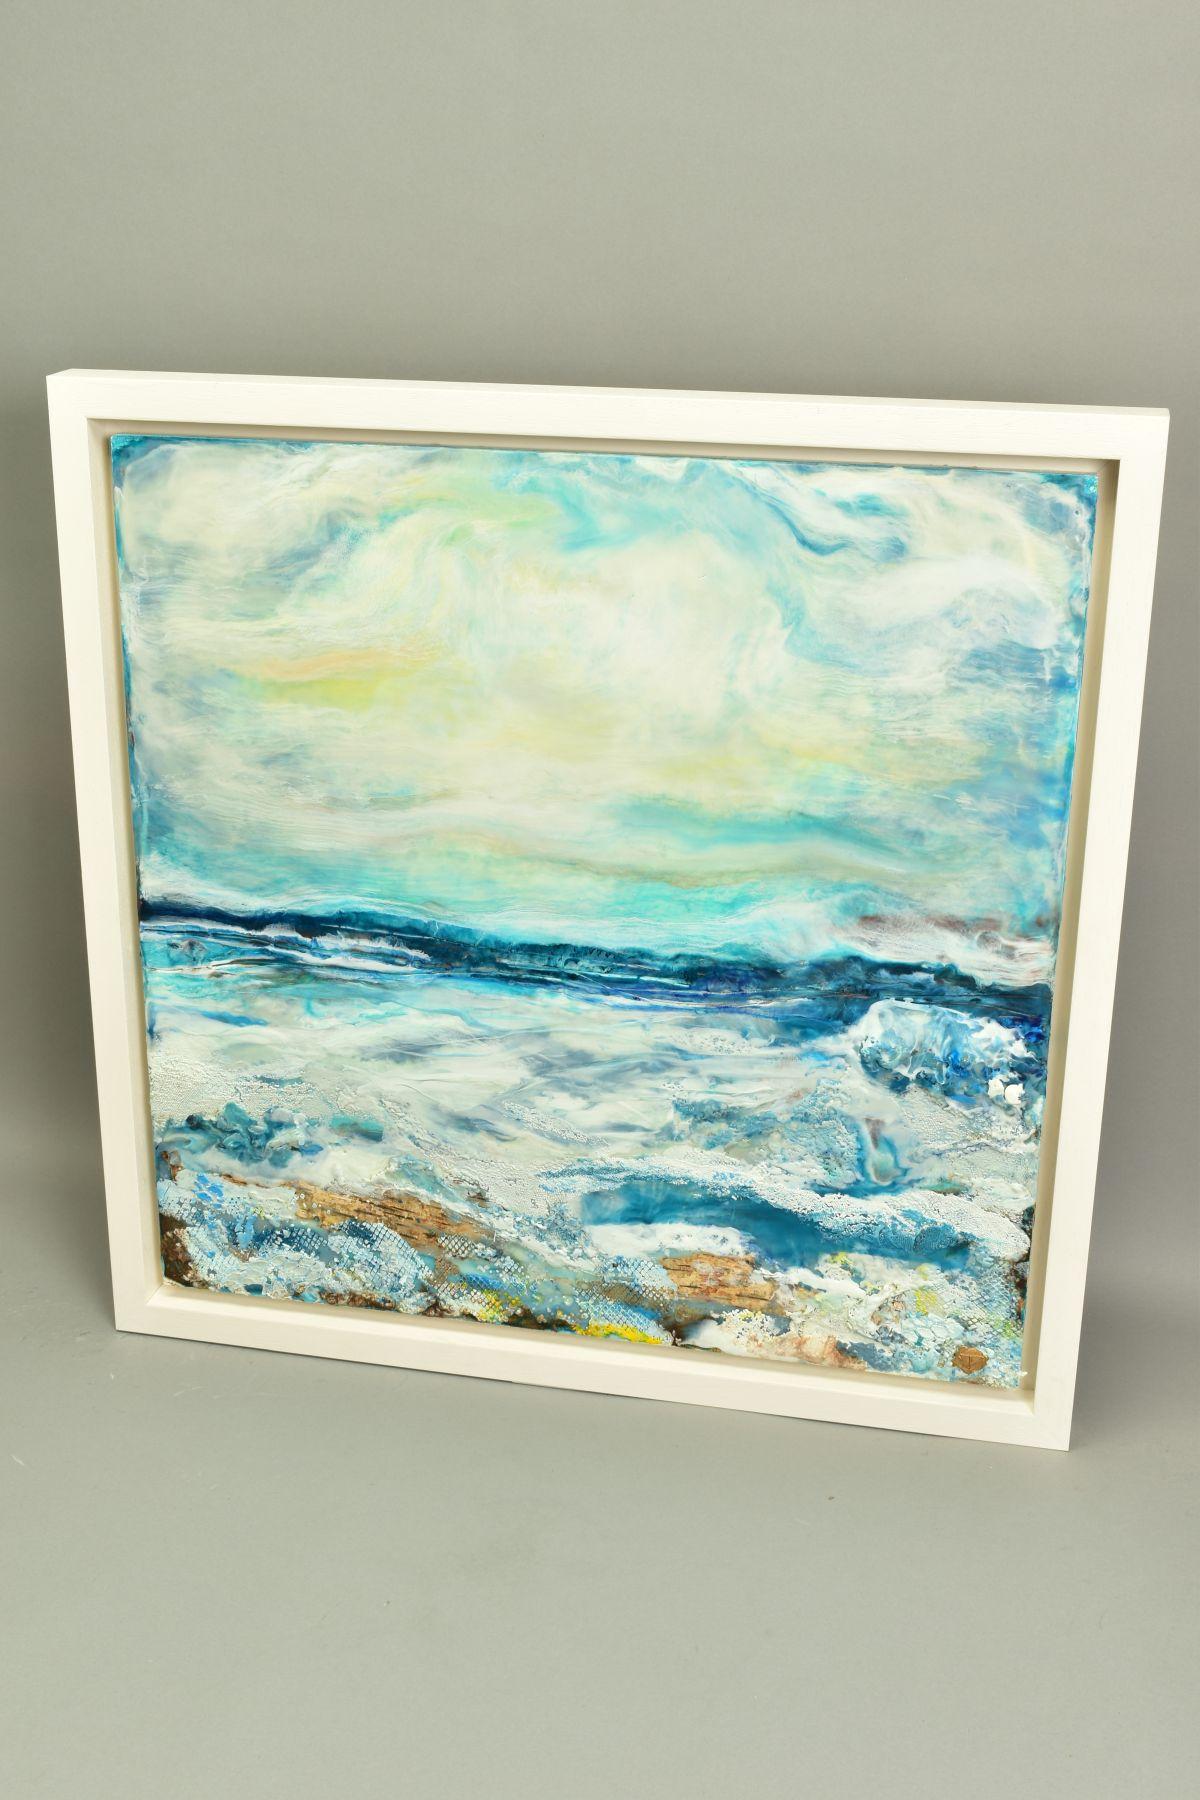 JENNINE PARKER (BRITISH 1971), 'Sea of Splendor', a coastal seascape, initialled bottom right, mixed - Image 5 of 7